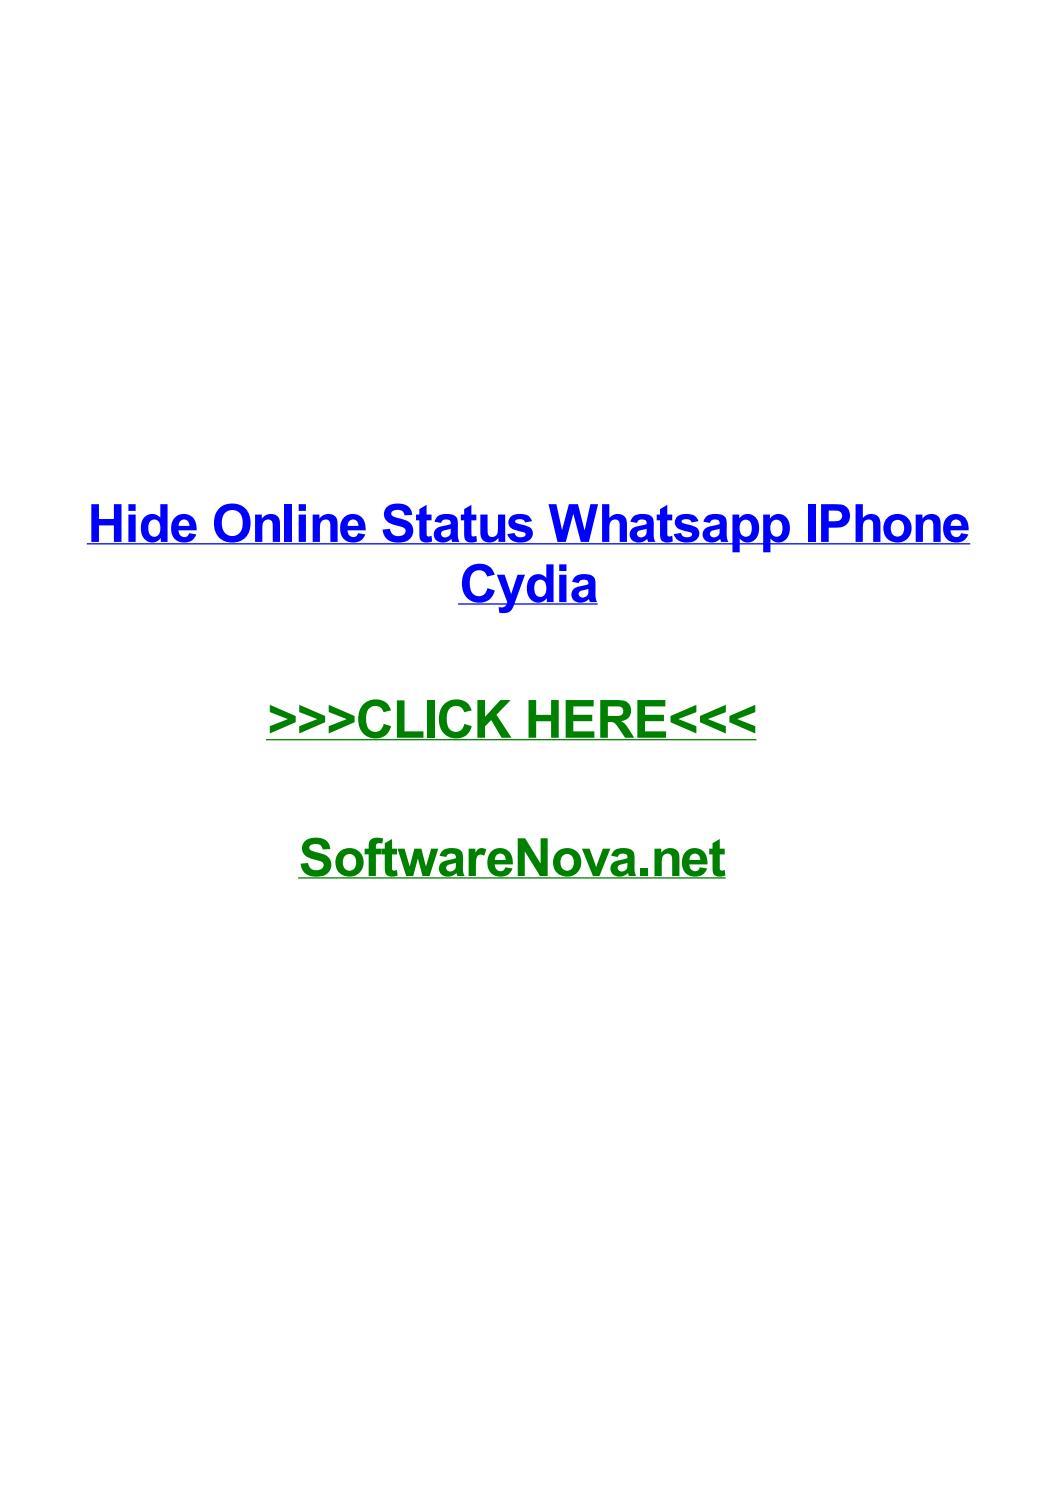 Hide online status whatsapp iphone cydia by lisahtwc - issuu